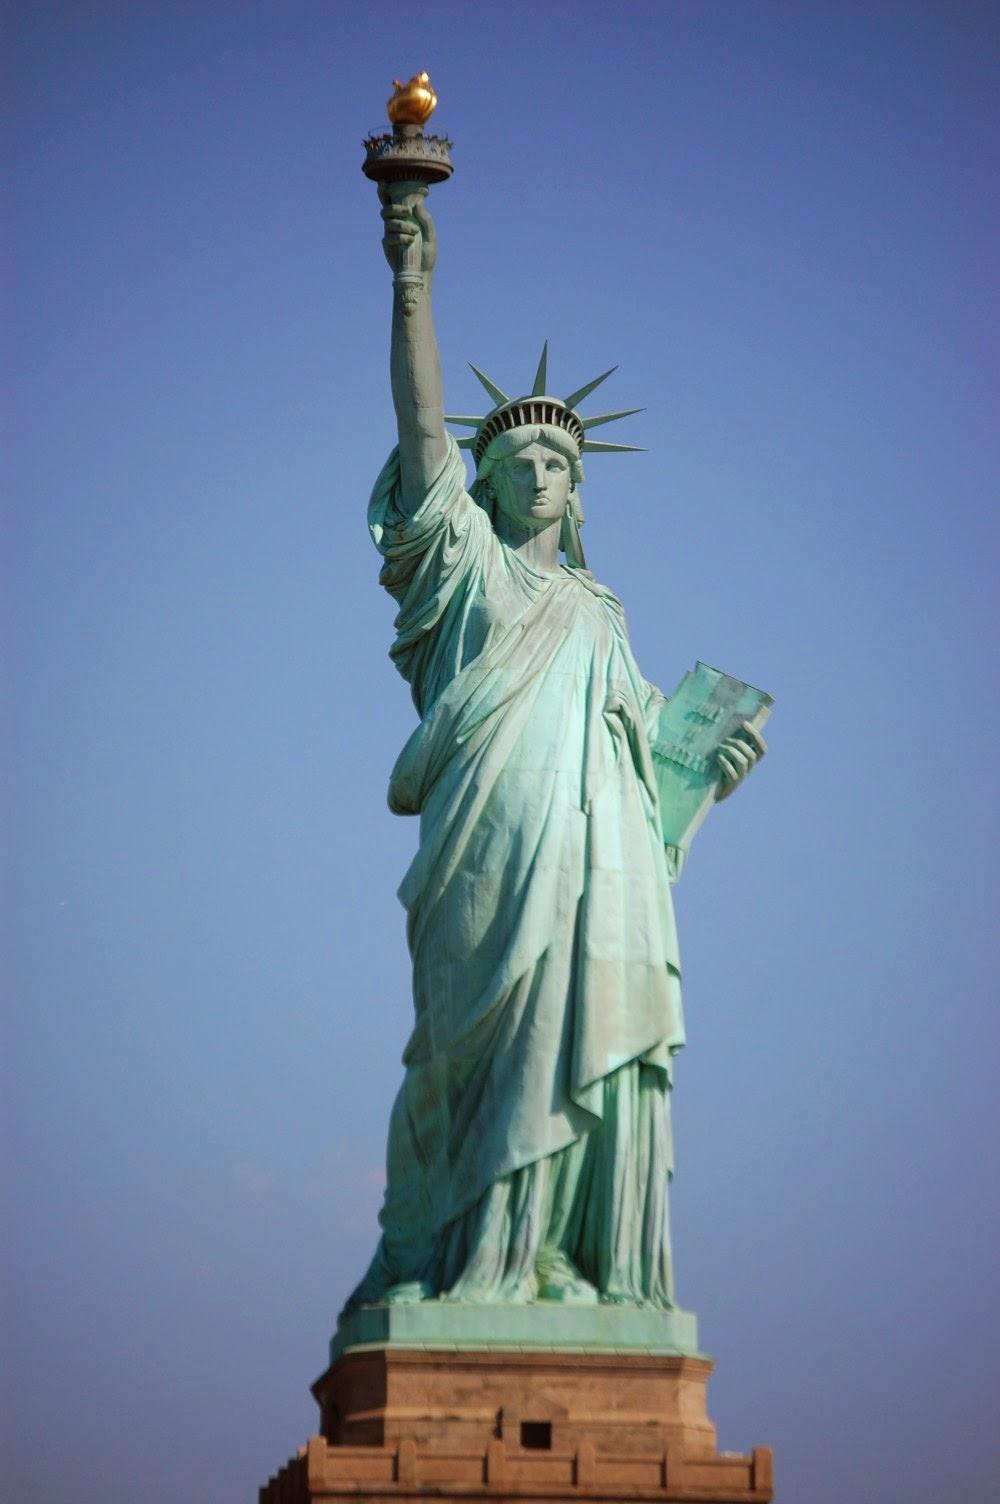 Fawkes news les codes cach s des illuminati dans la for Createur statue de la liberte